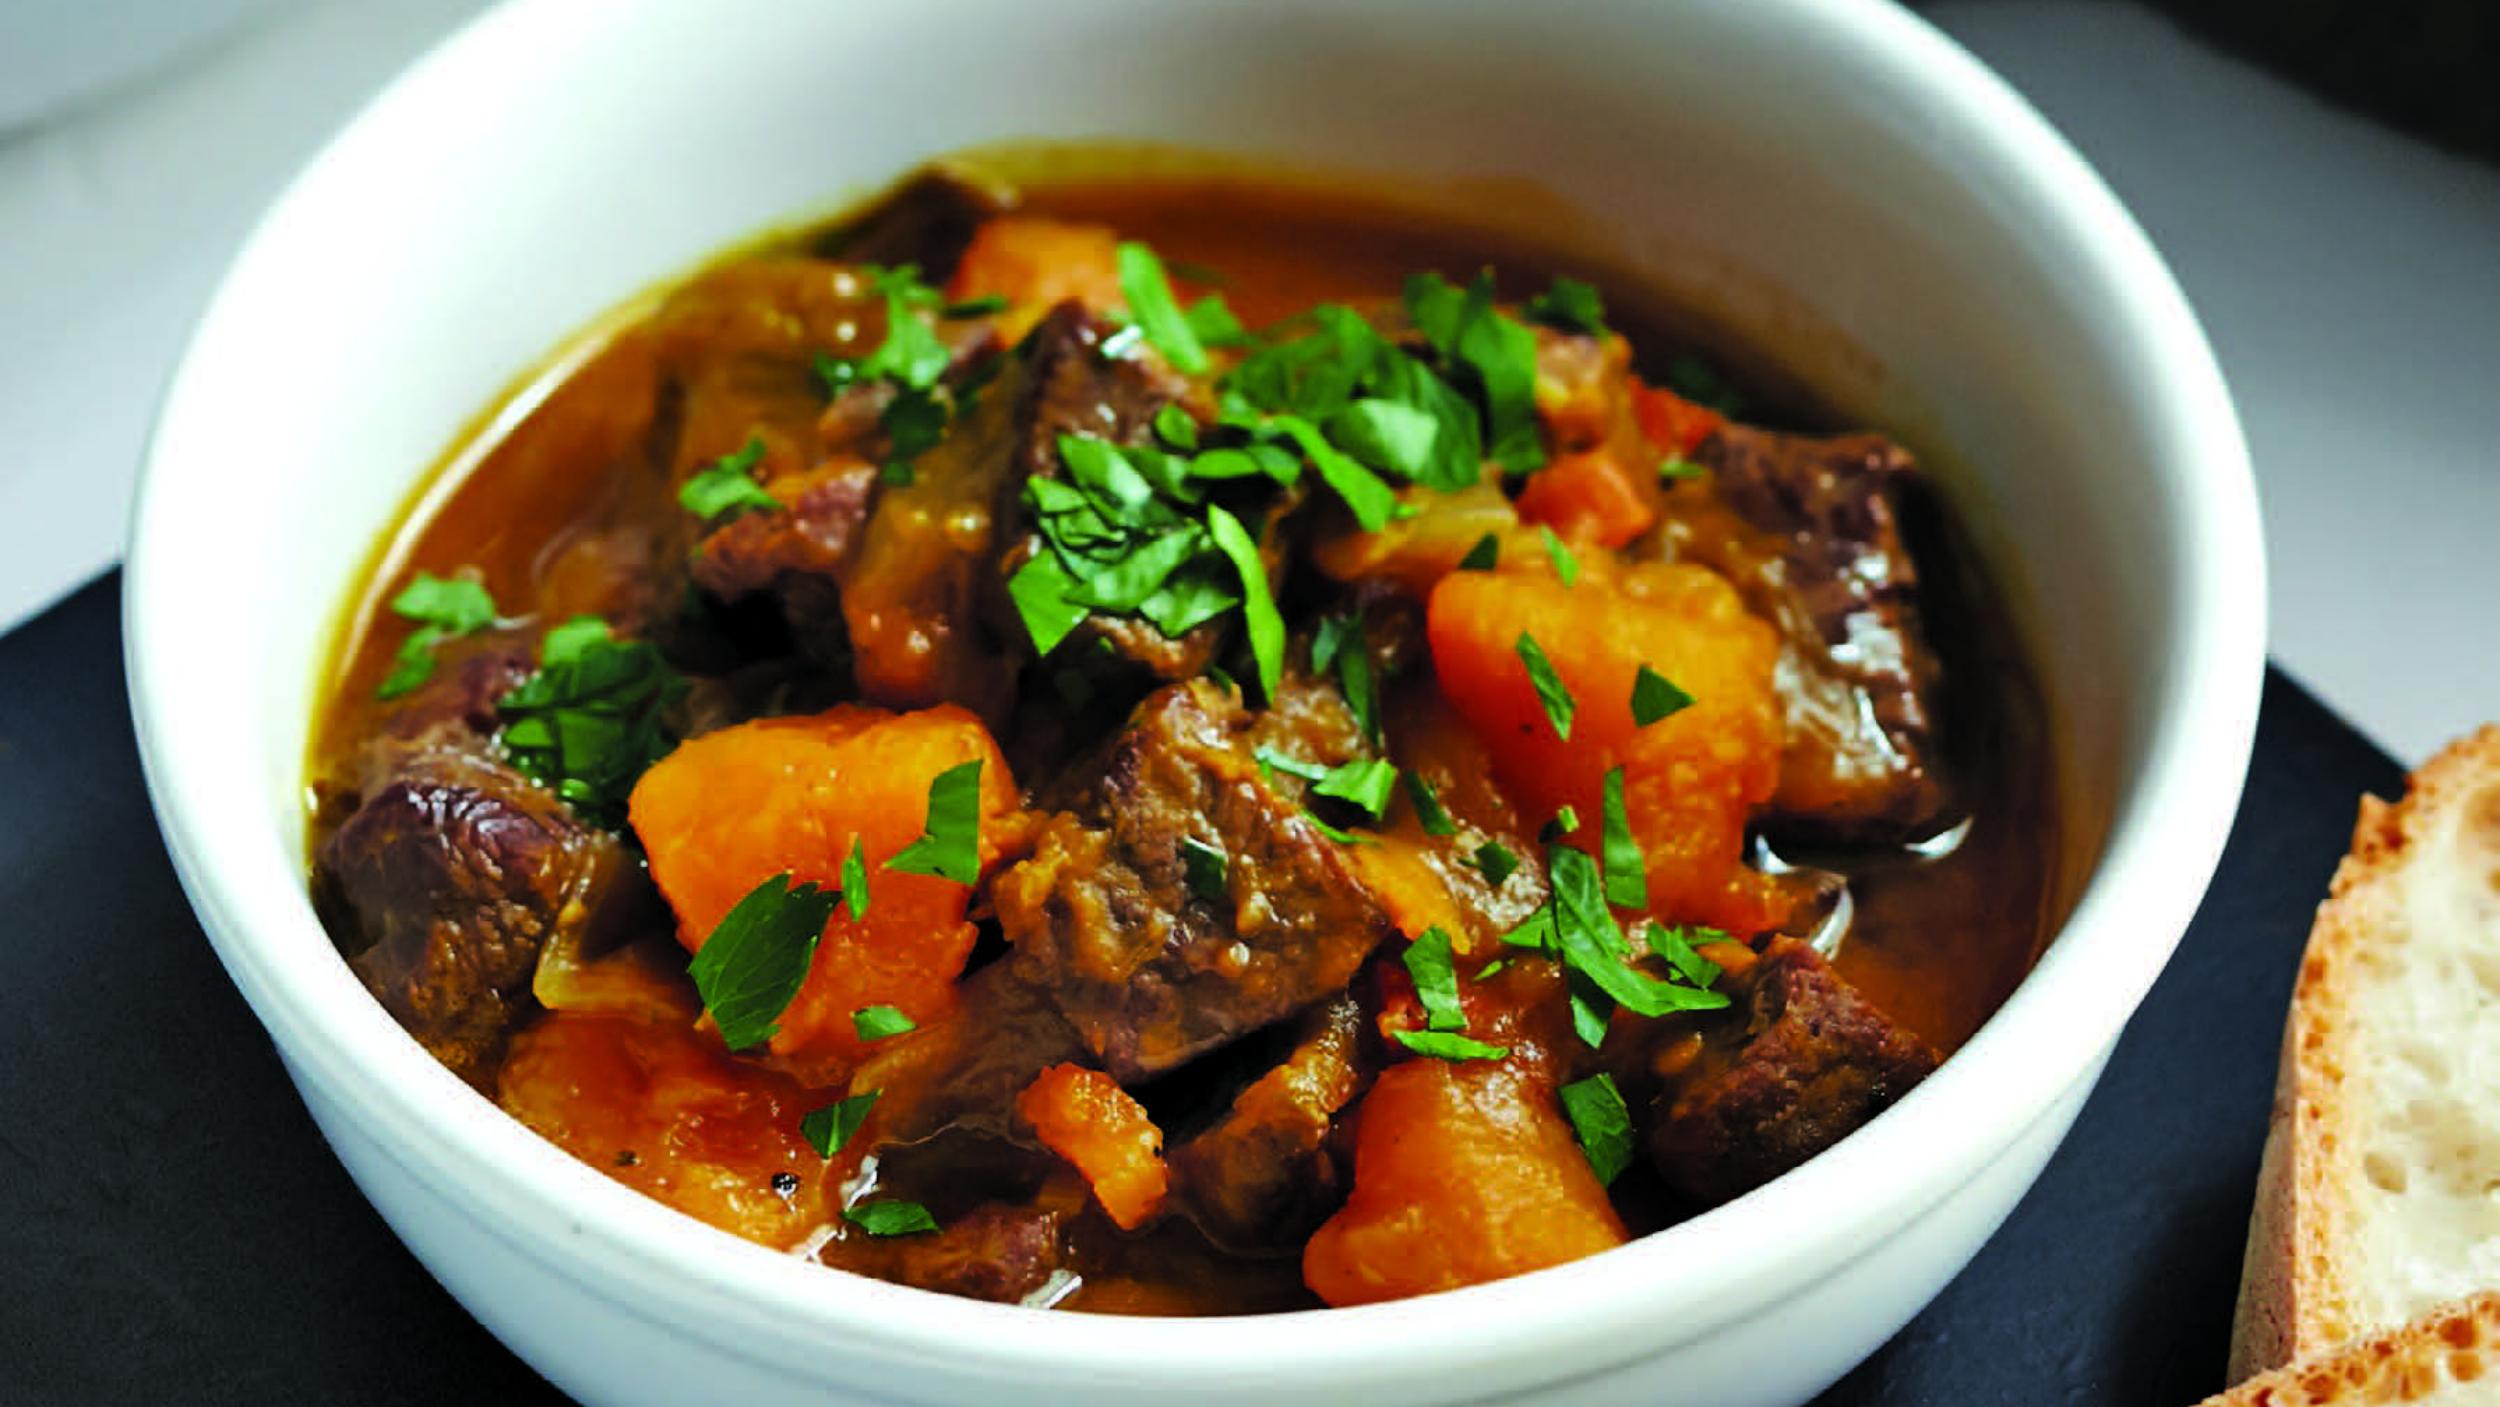 Beef Stew Ina Garten beef stew ina garten ~ peeinn